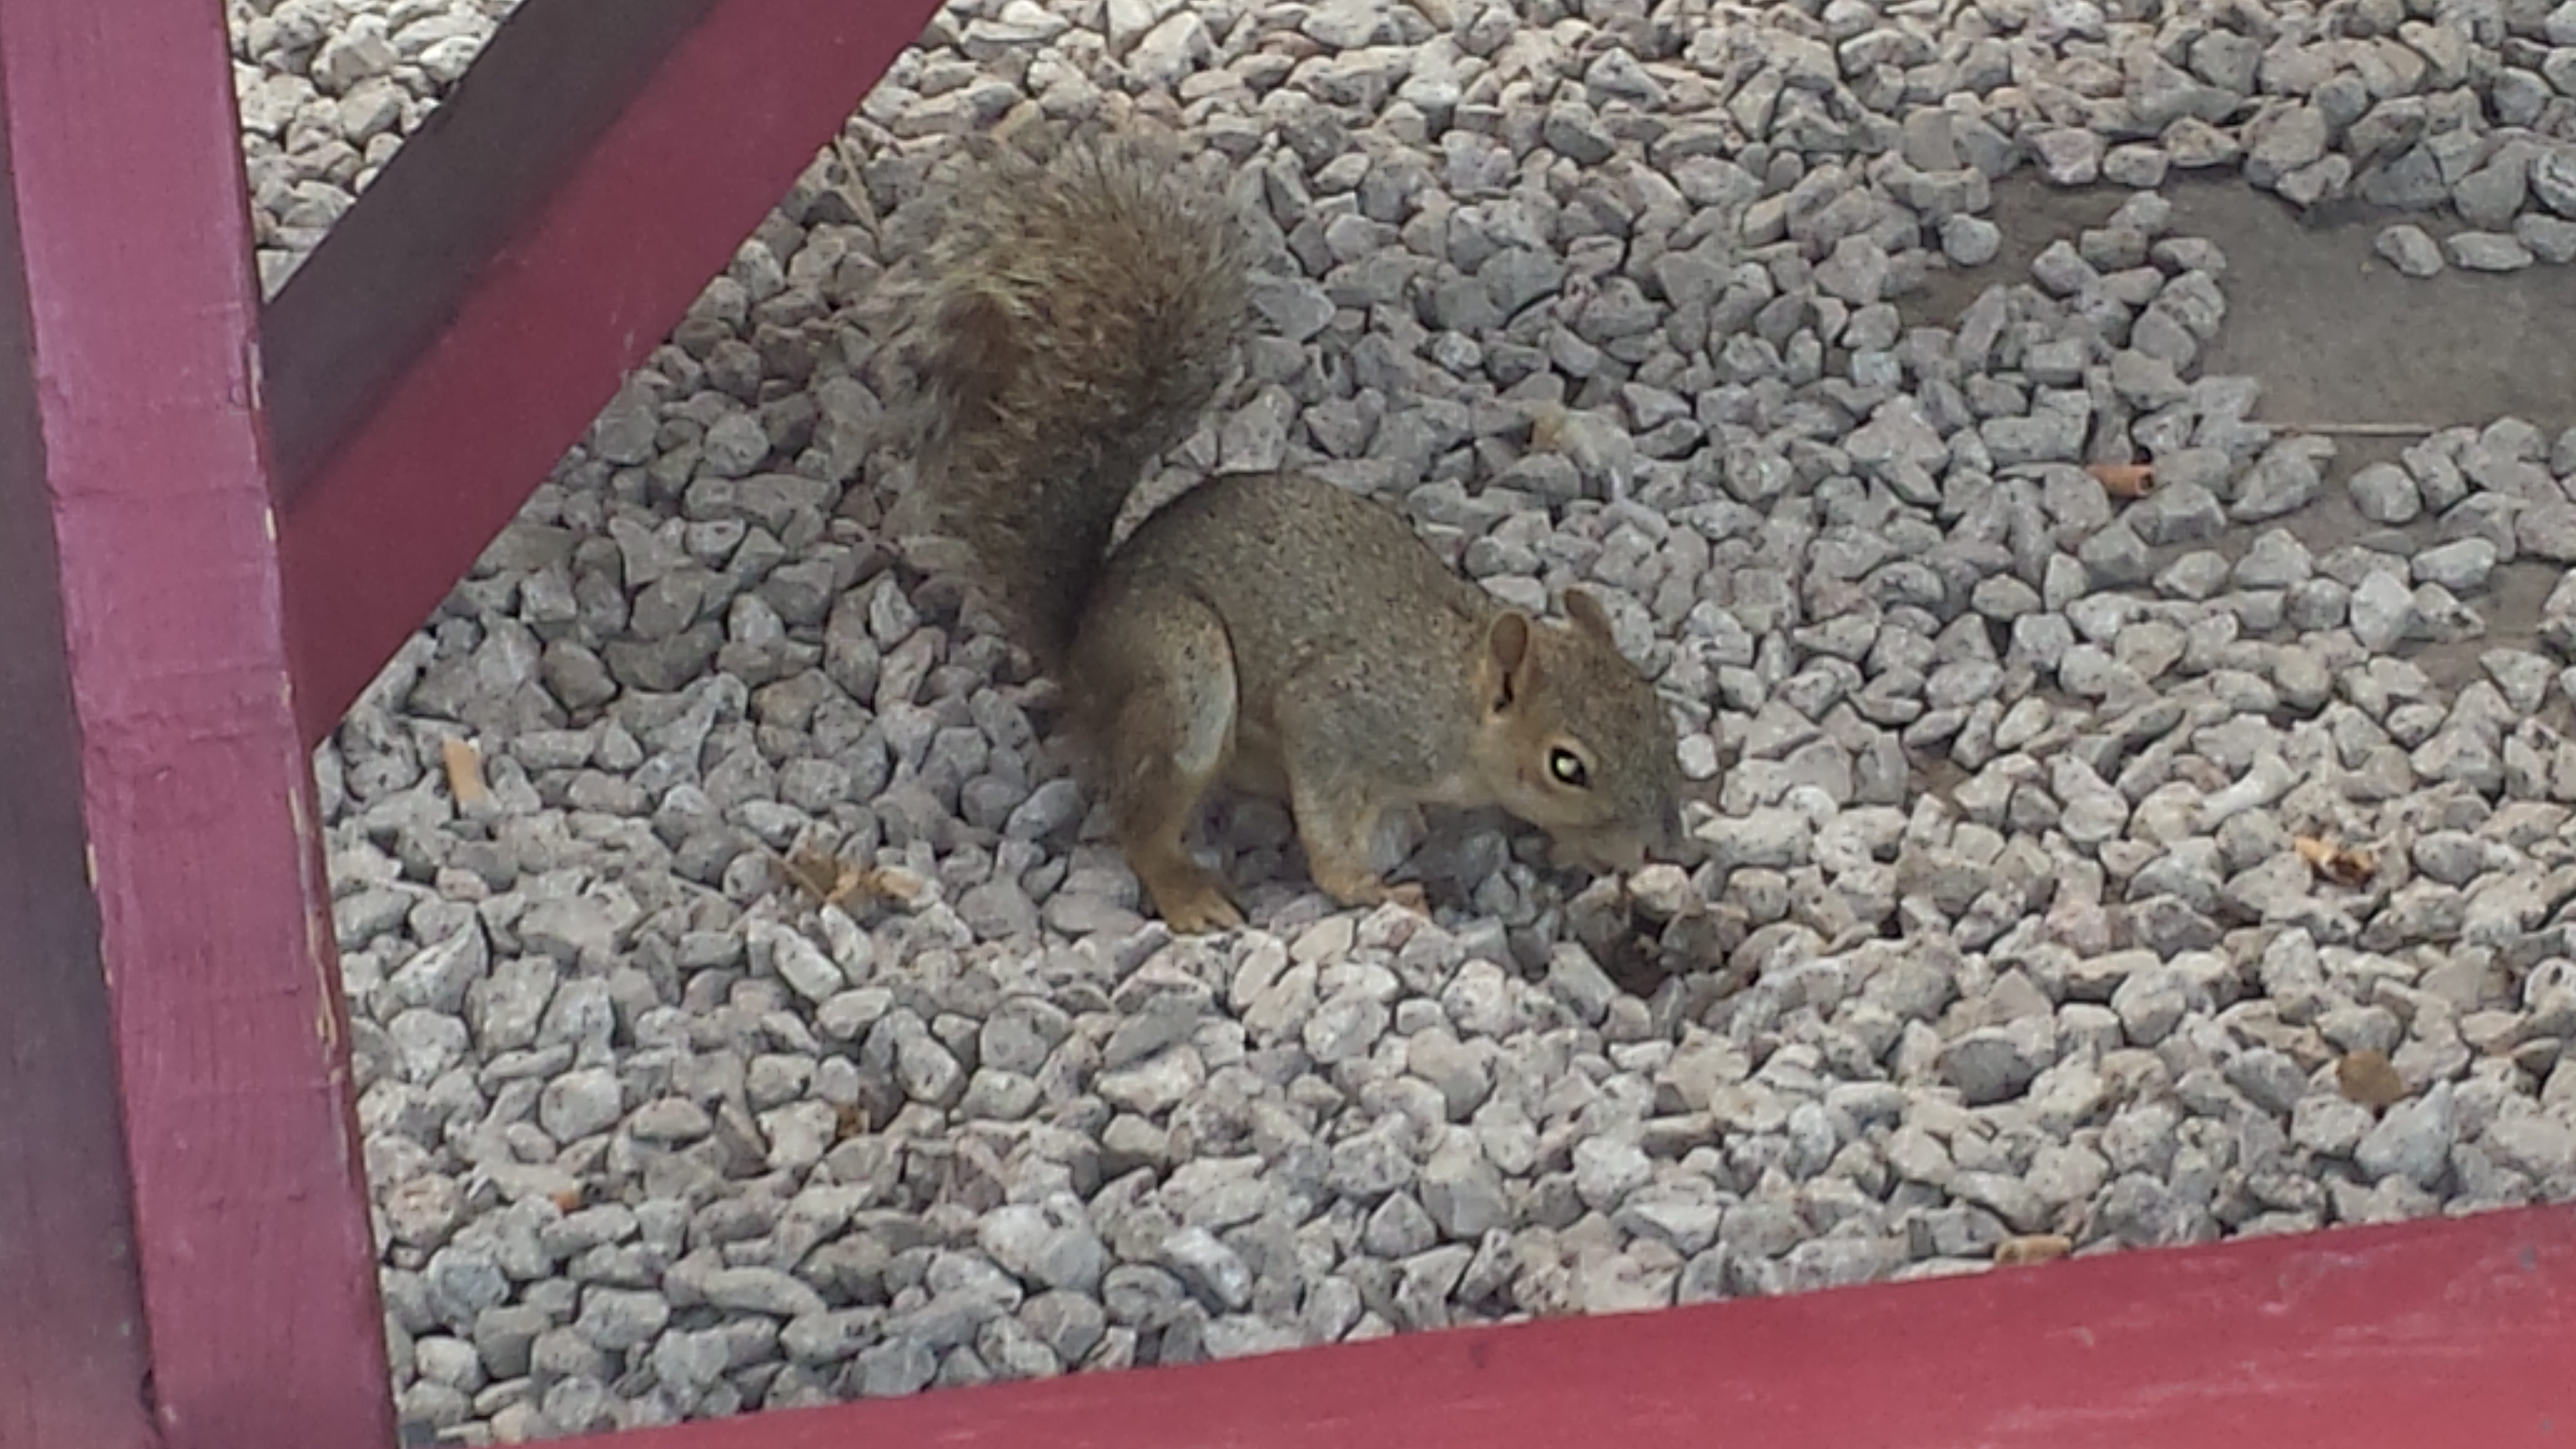 Eastern gray squirrel on Rainey Street, Austin, Texas, 19 June 2016.